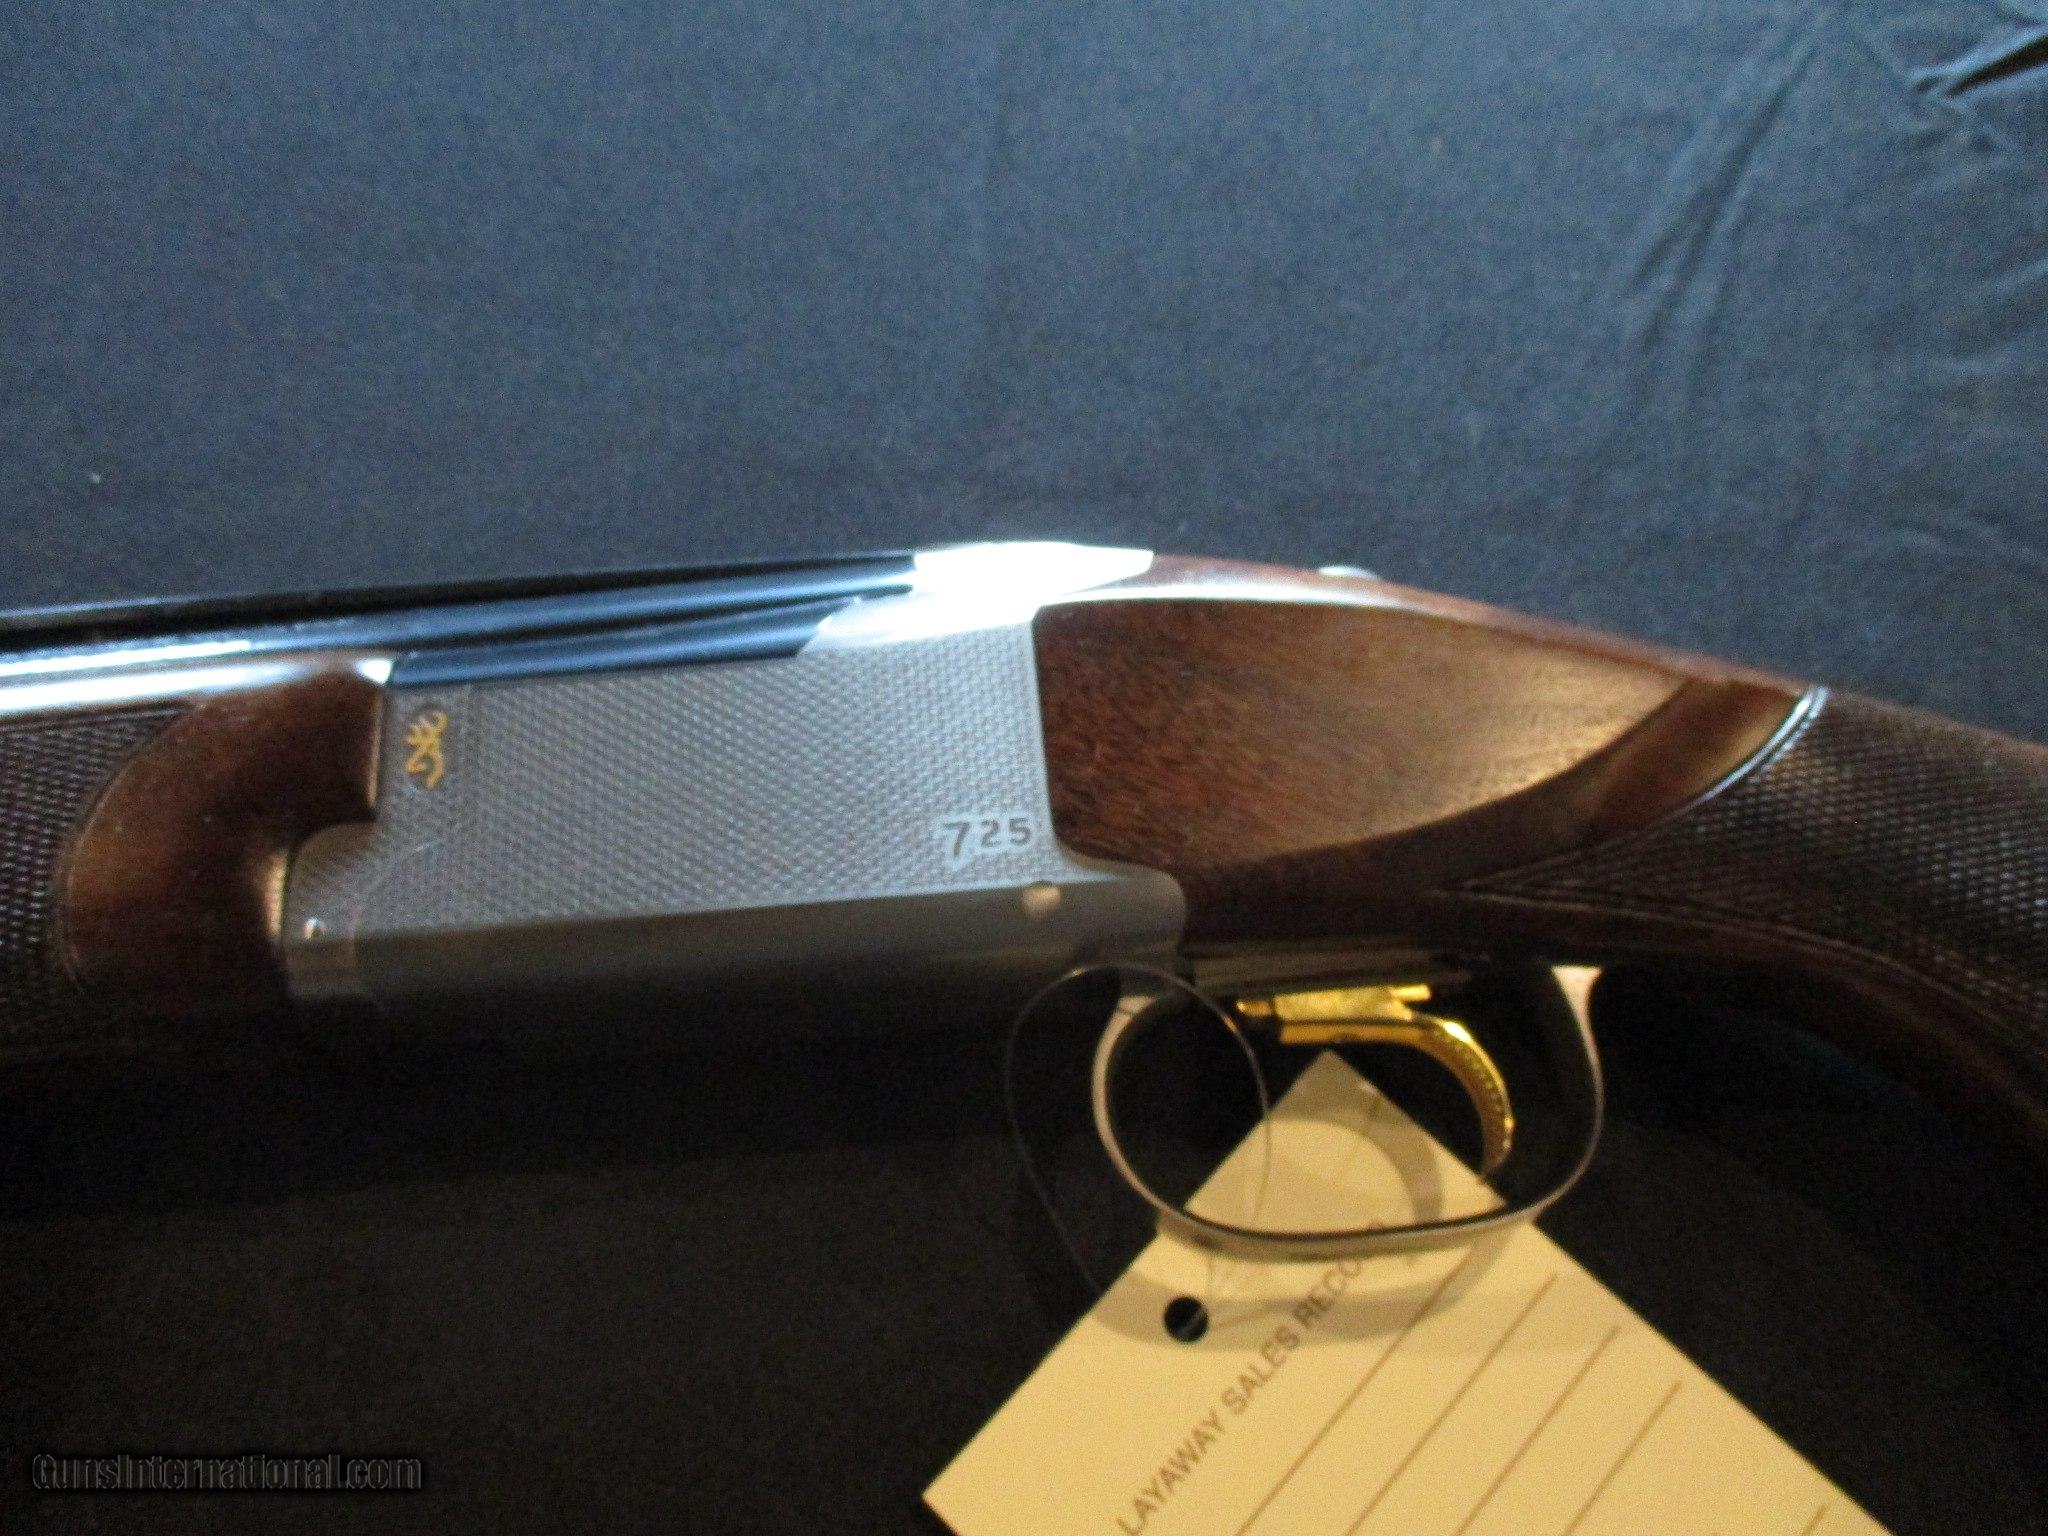 Browning Citori 725 Sport LEFT HAND LH 12ga, 32